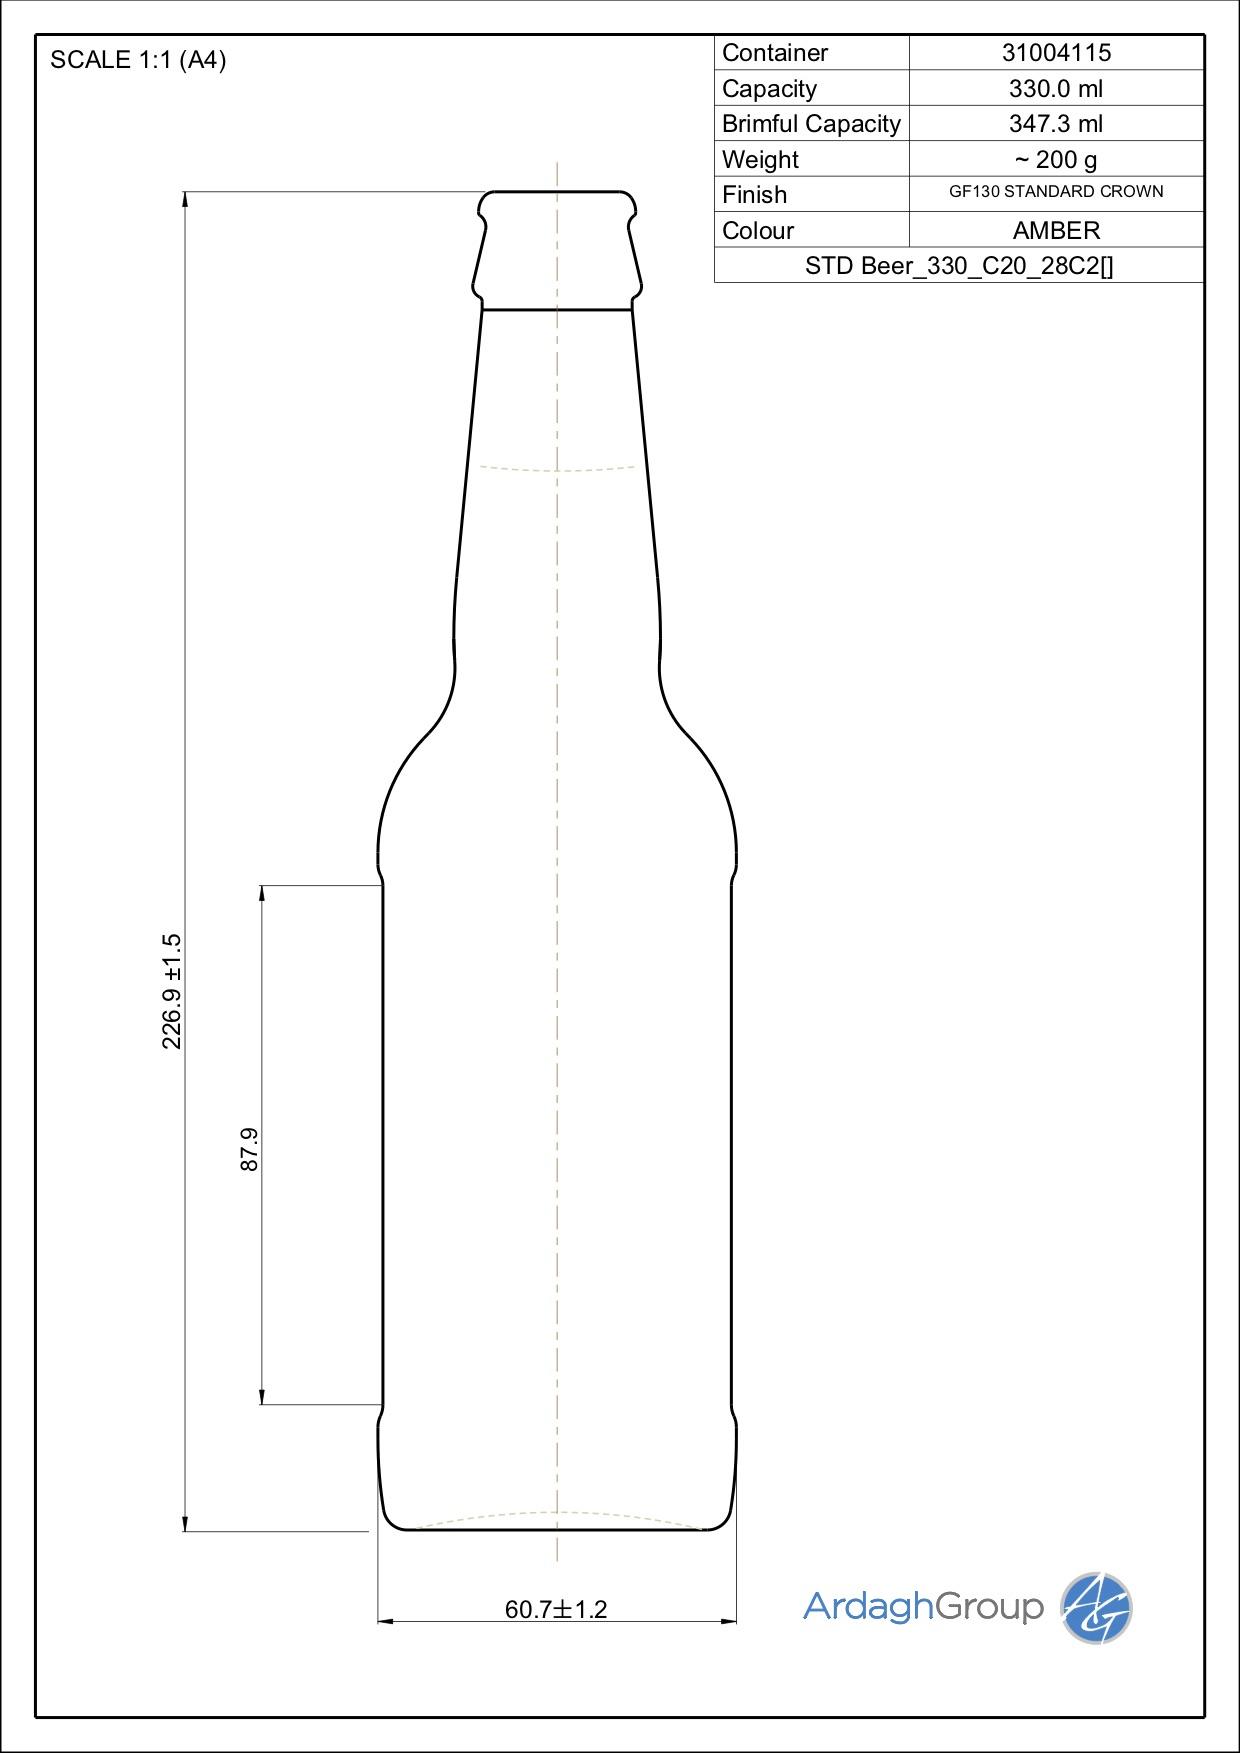 STD Beer_330_C20_28C2